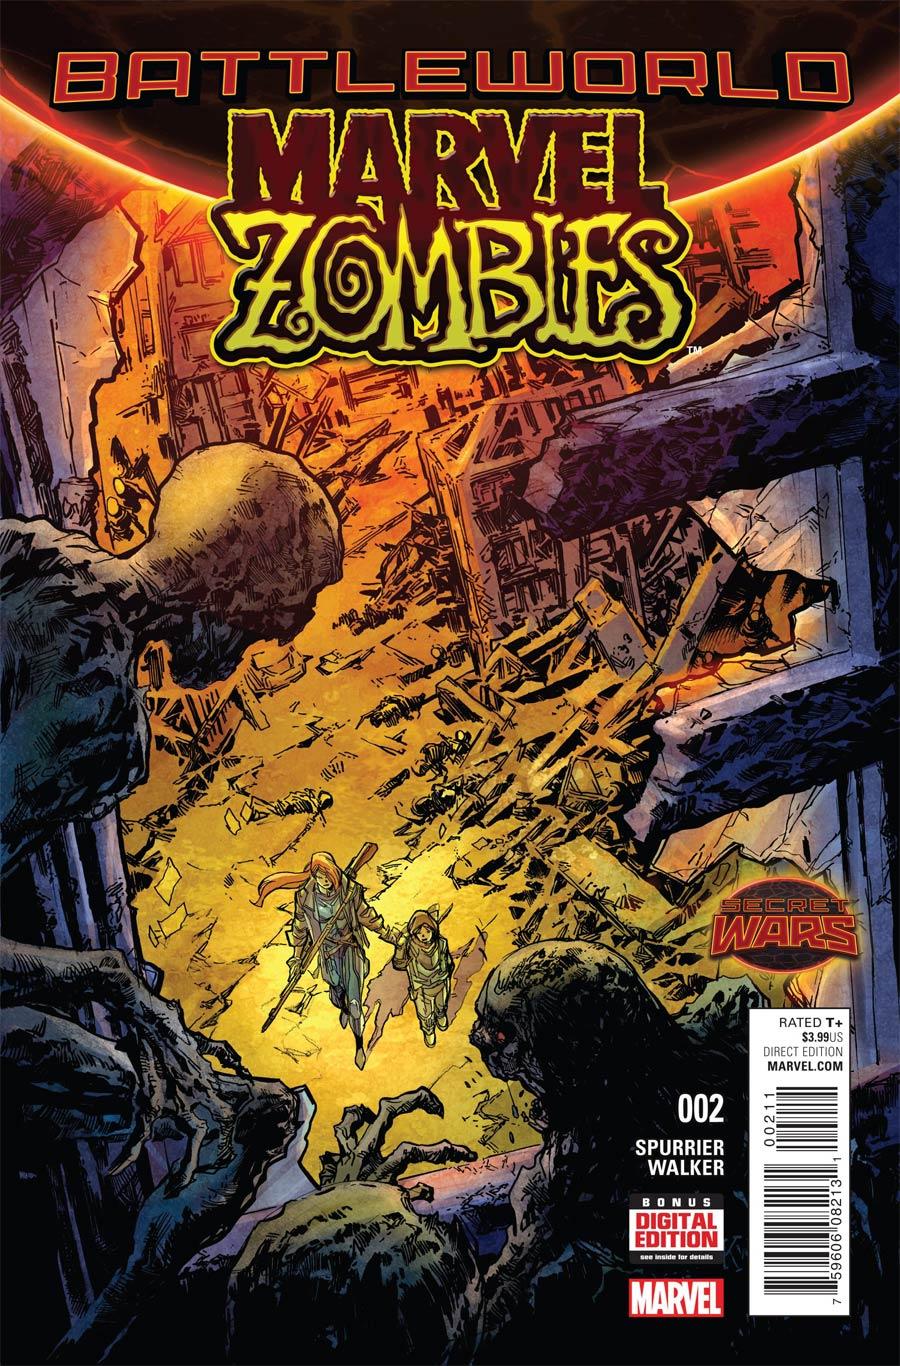 Marvel Zombies Vol 6 #2 Cover A Regular Ken Lashley Cover (Secret Wars Battleworld Tie-In)